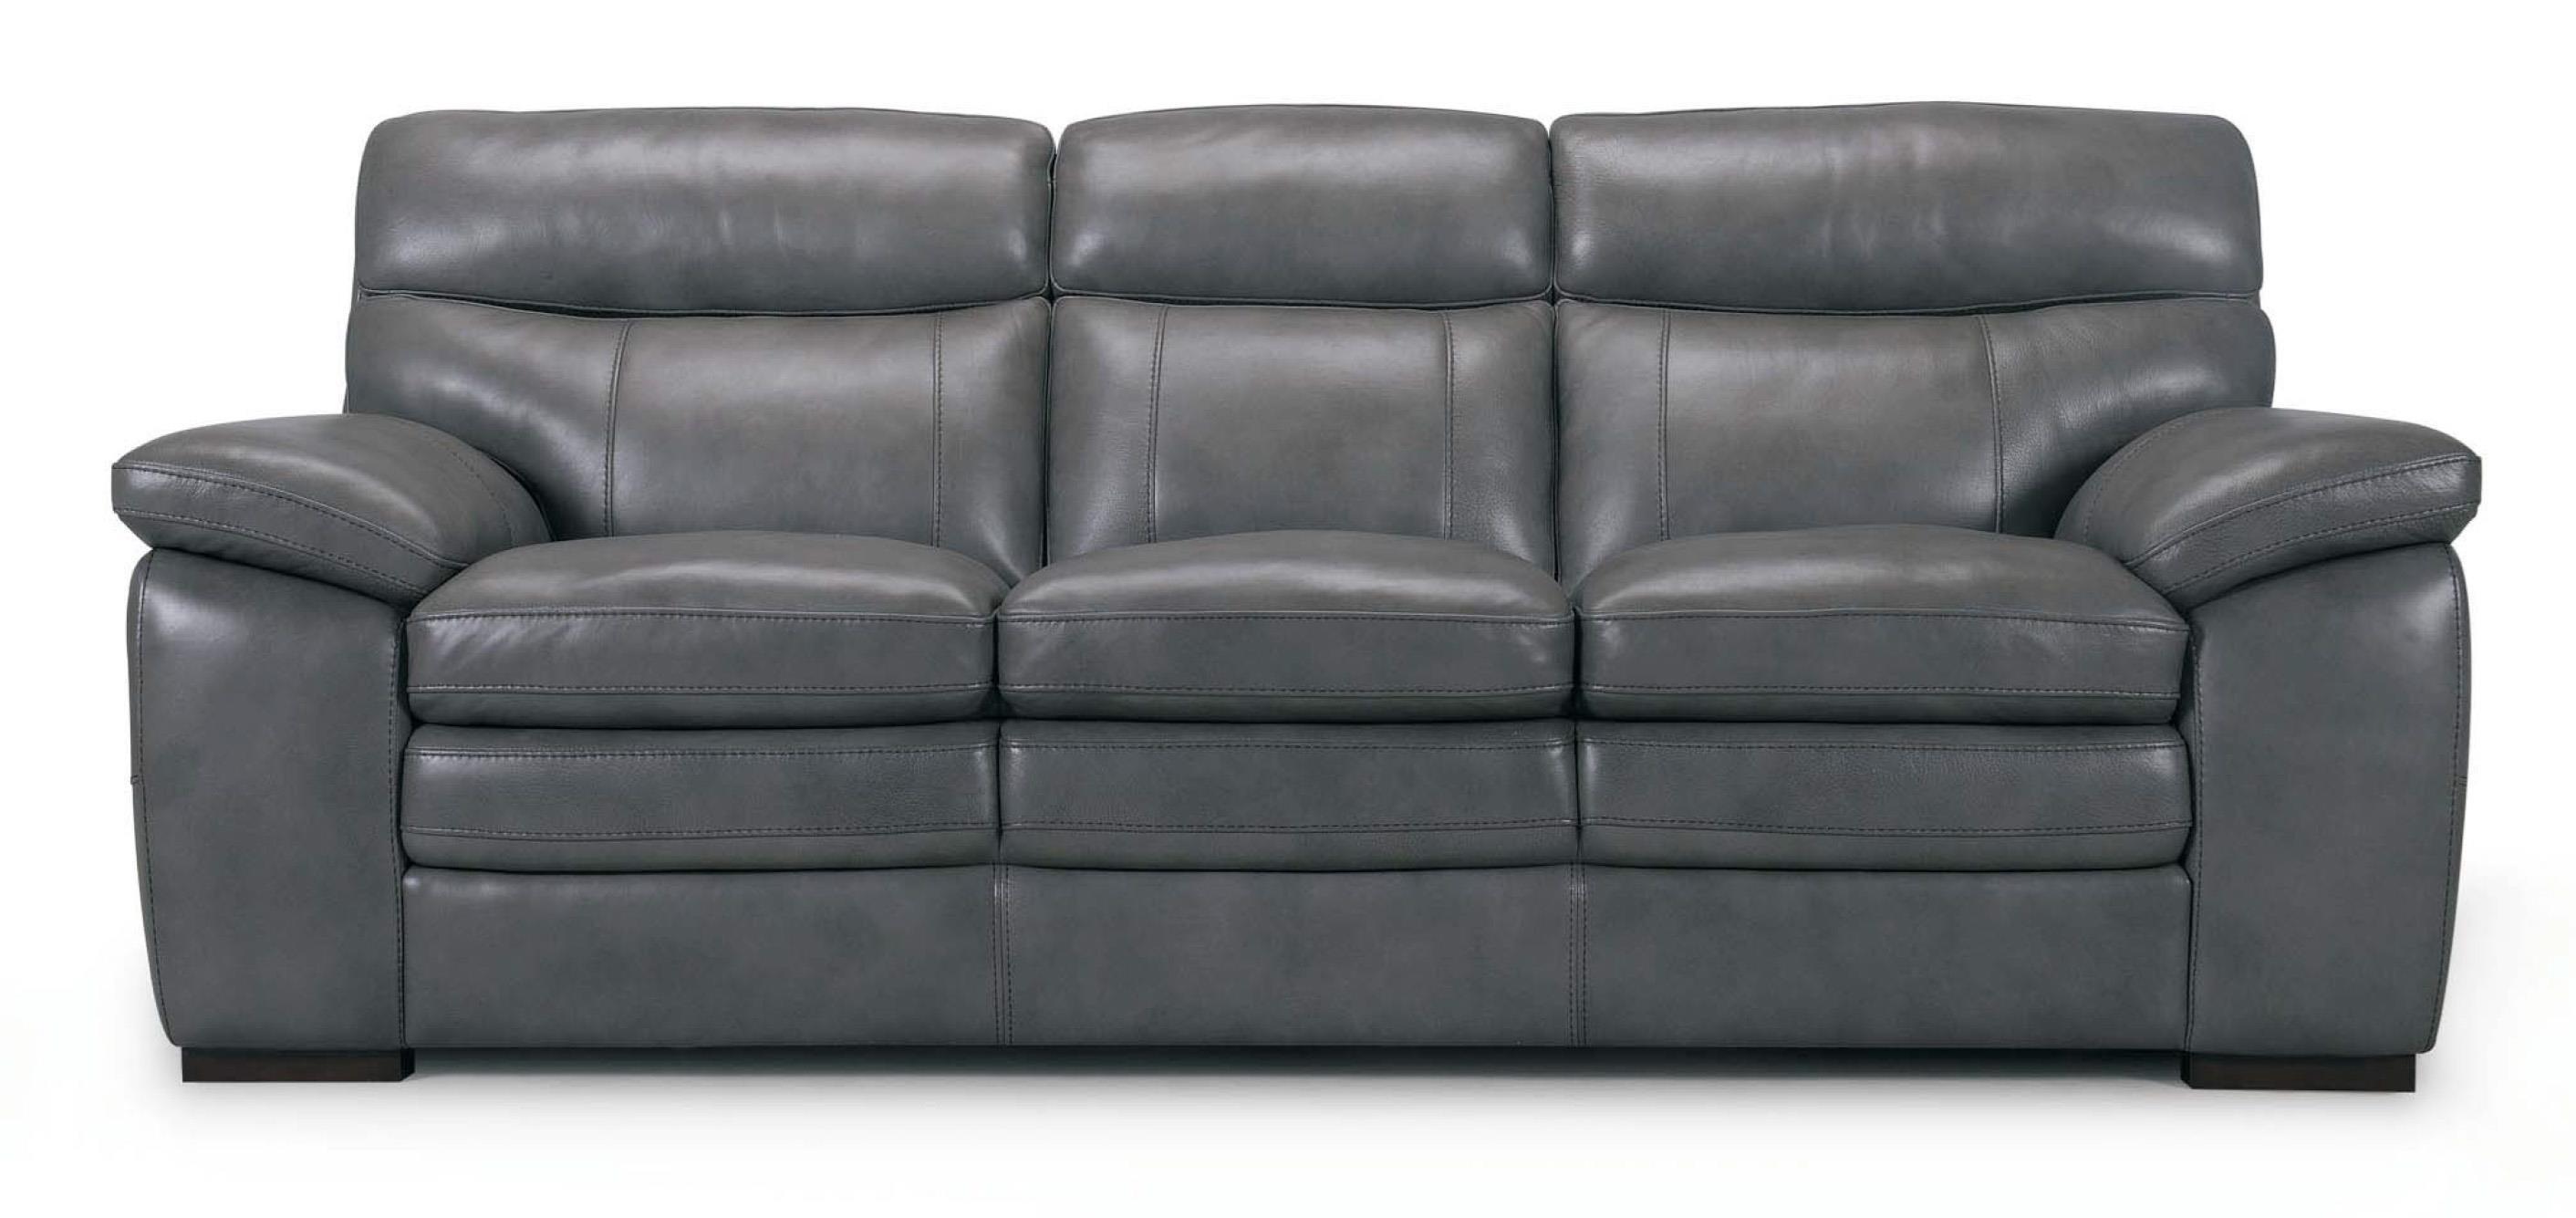 3658 Leather Sofa by Violino at O'Dunk & O'Bright Furniture